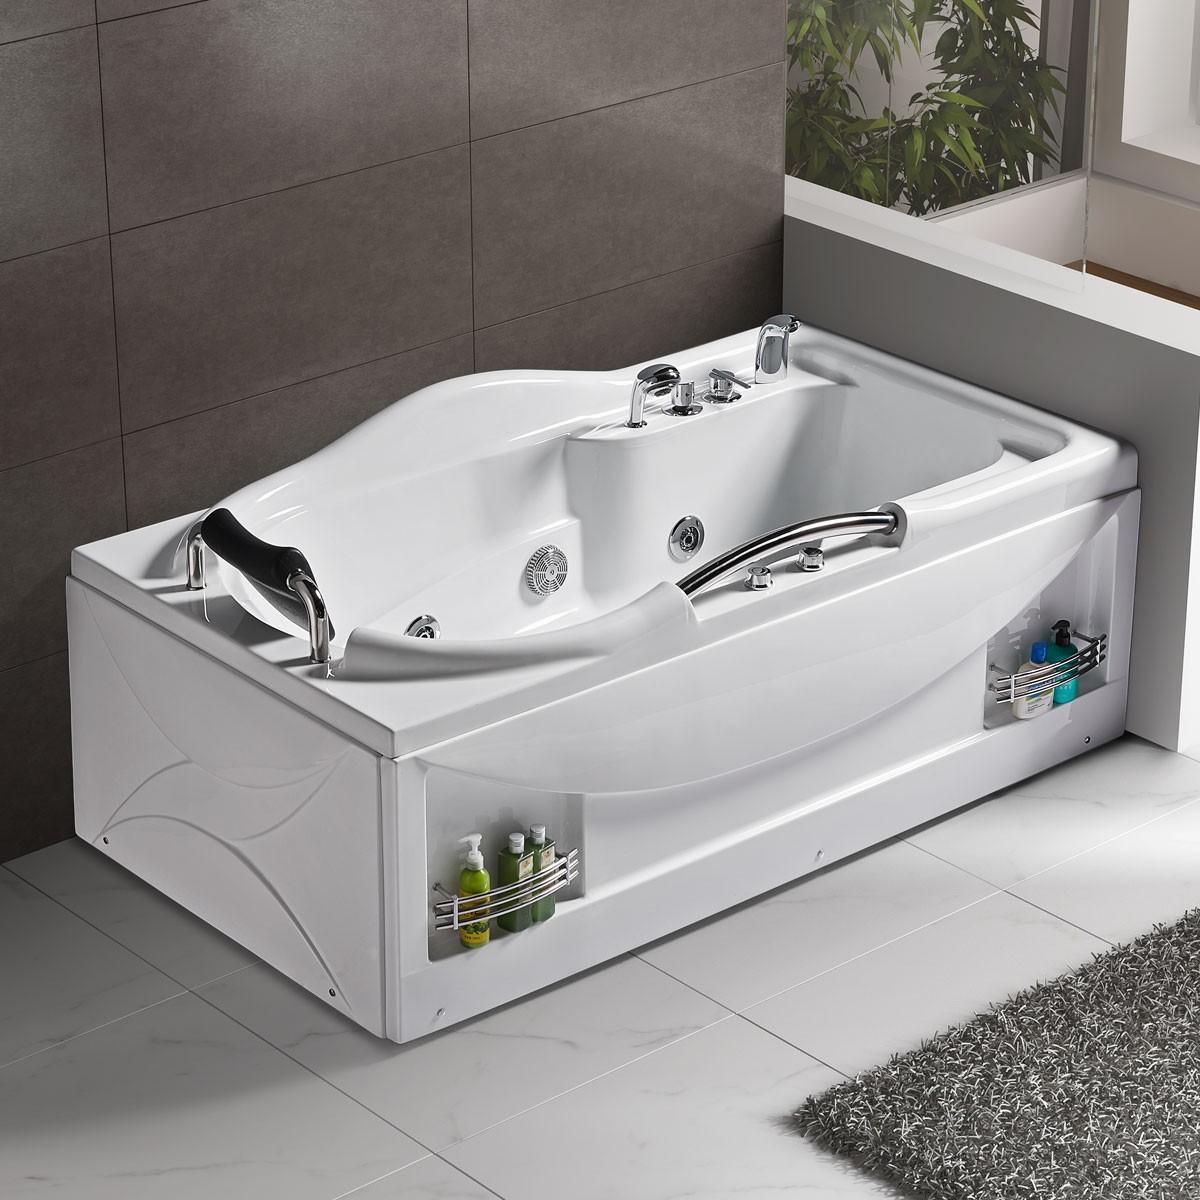 69 In Whirlpool Tub - Acrylic White (DK-Q314) | Decoraport Canada